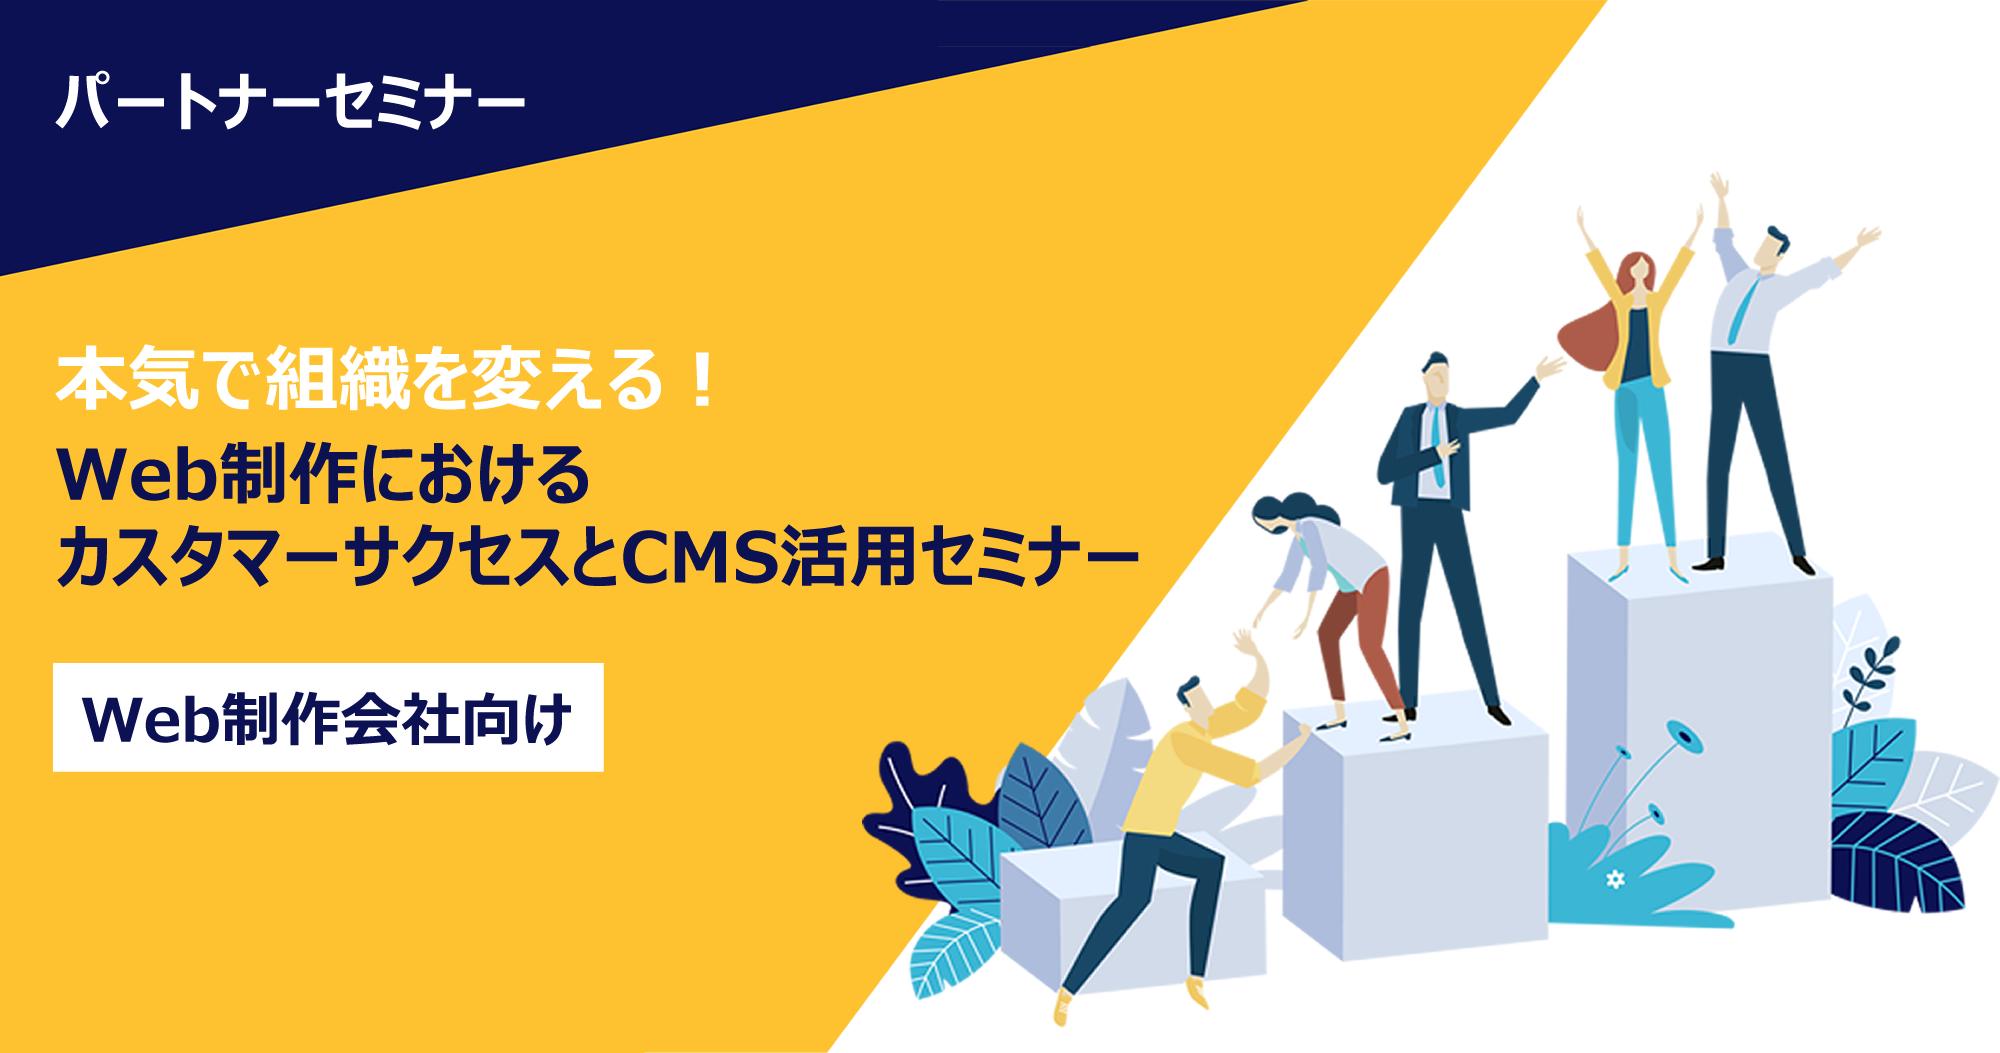 [Web制作会社向け]Web制作業界におけるカスタマーサクセスとCMS活用セミナー